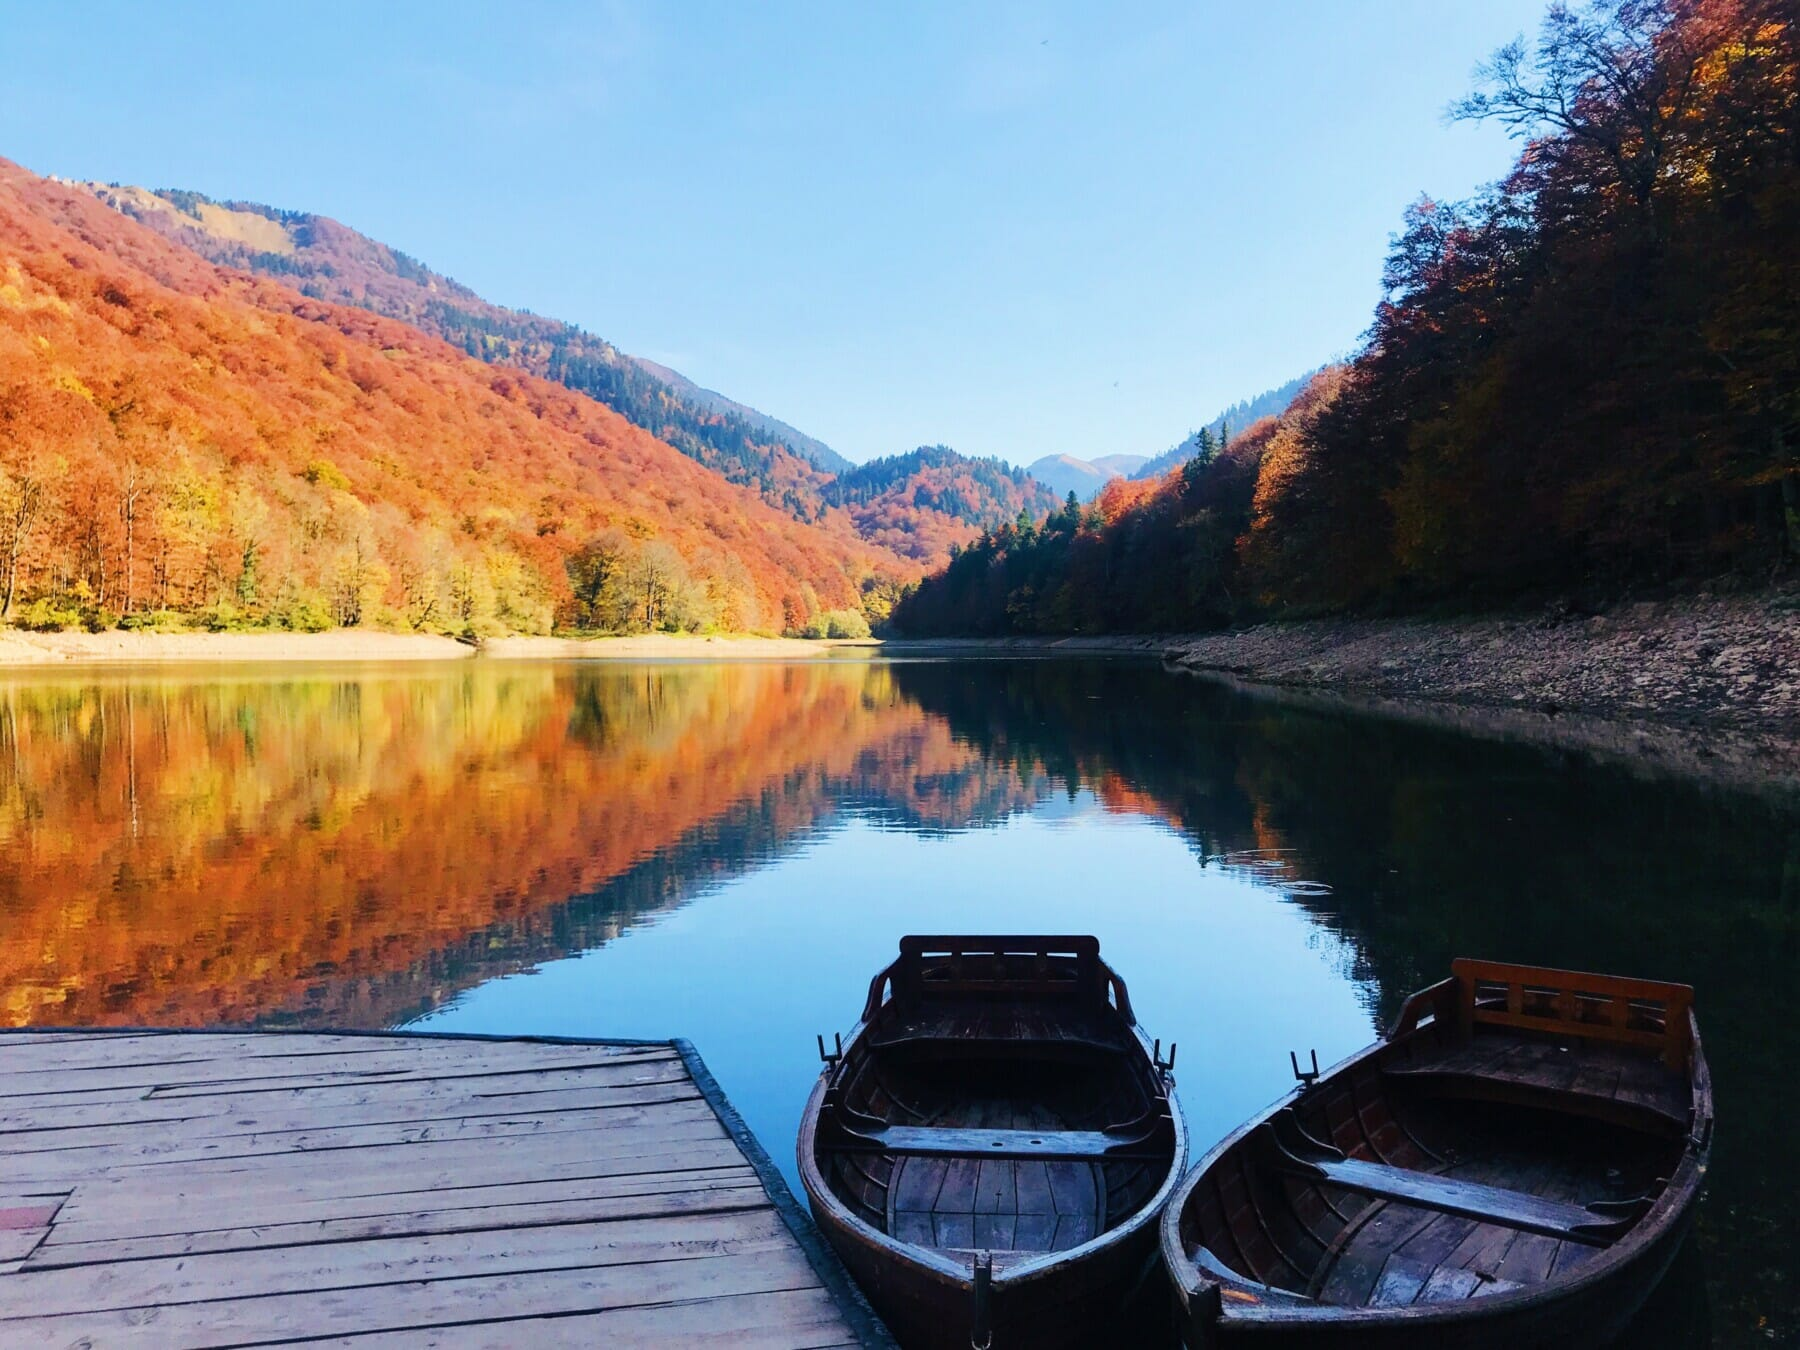 Boats on the reflective Biograd lake in NP Biogradska gora in Montenegro